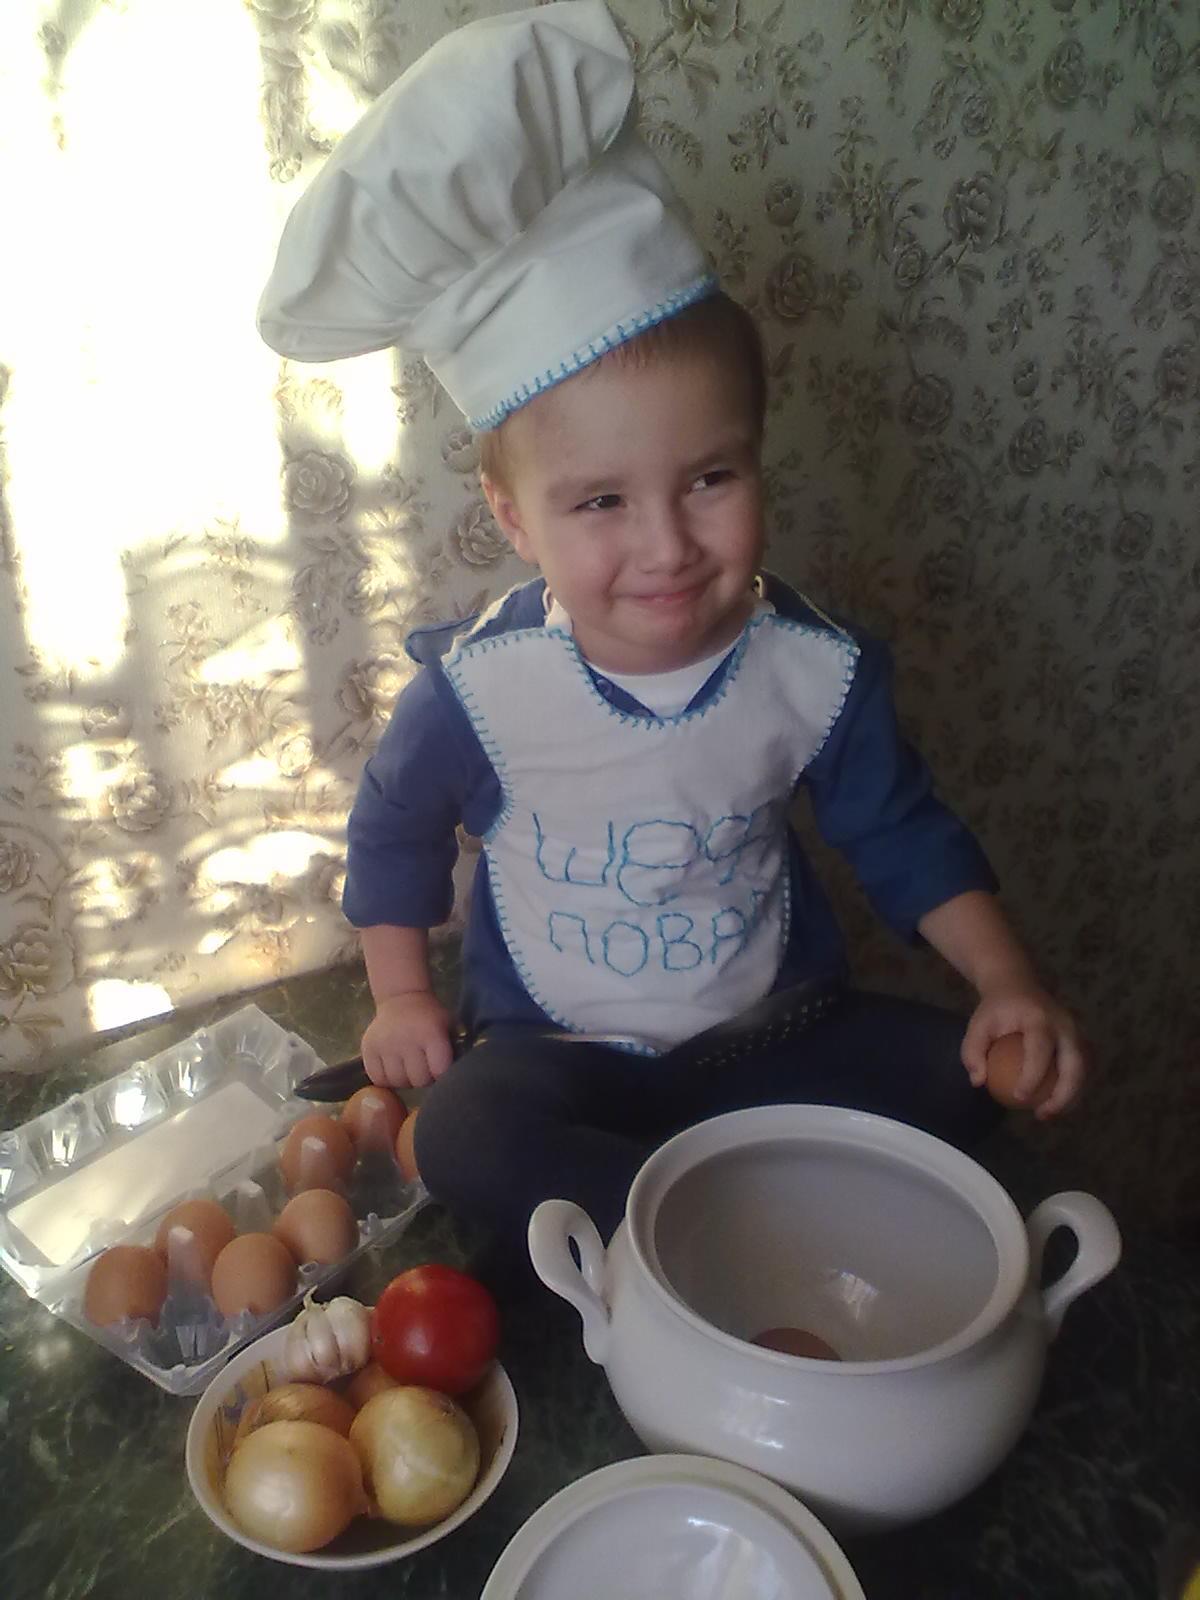 Талантливый юный кулинар. Юные кулинары